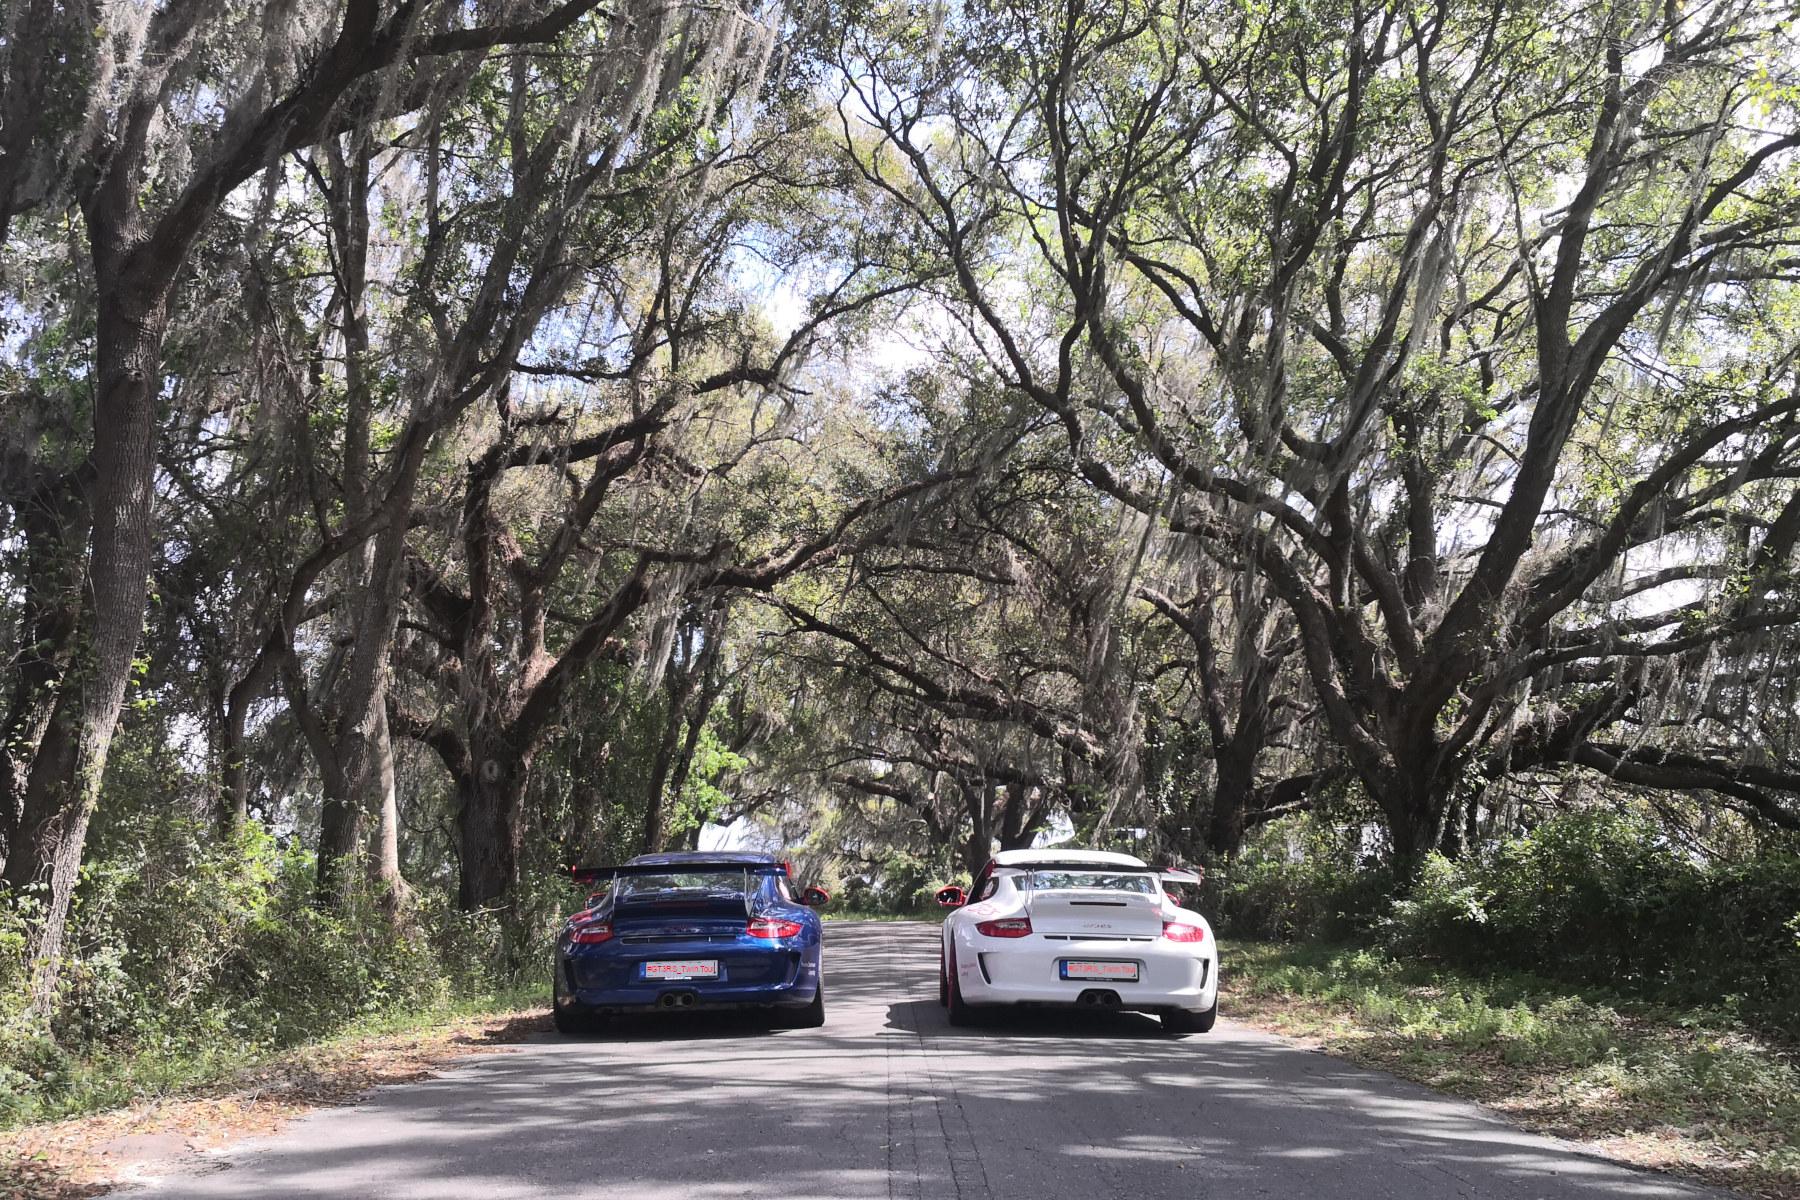 911 GT3 RS under live oaks (2)